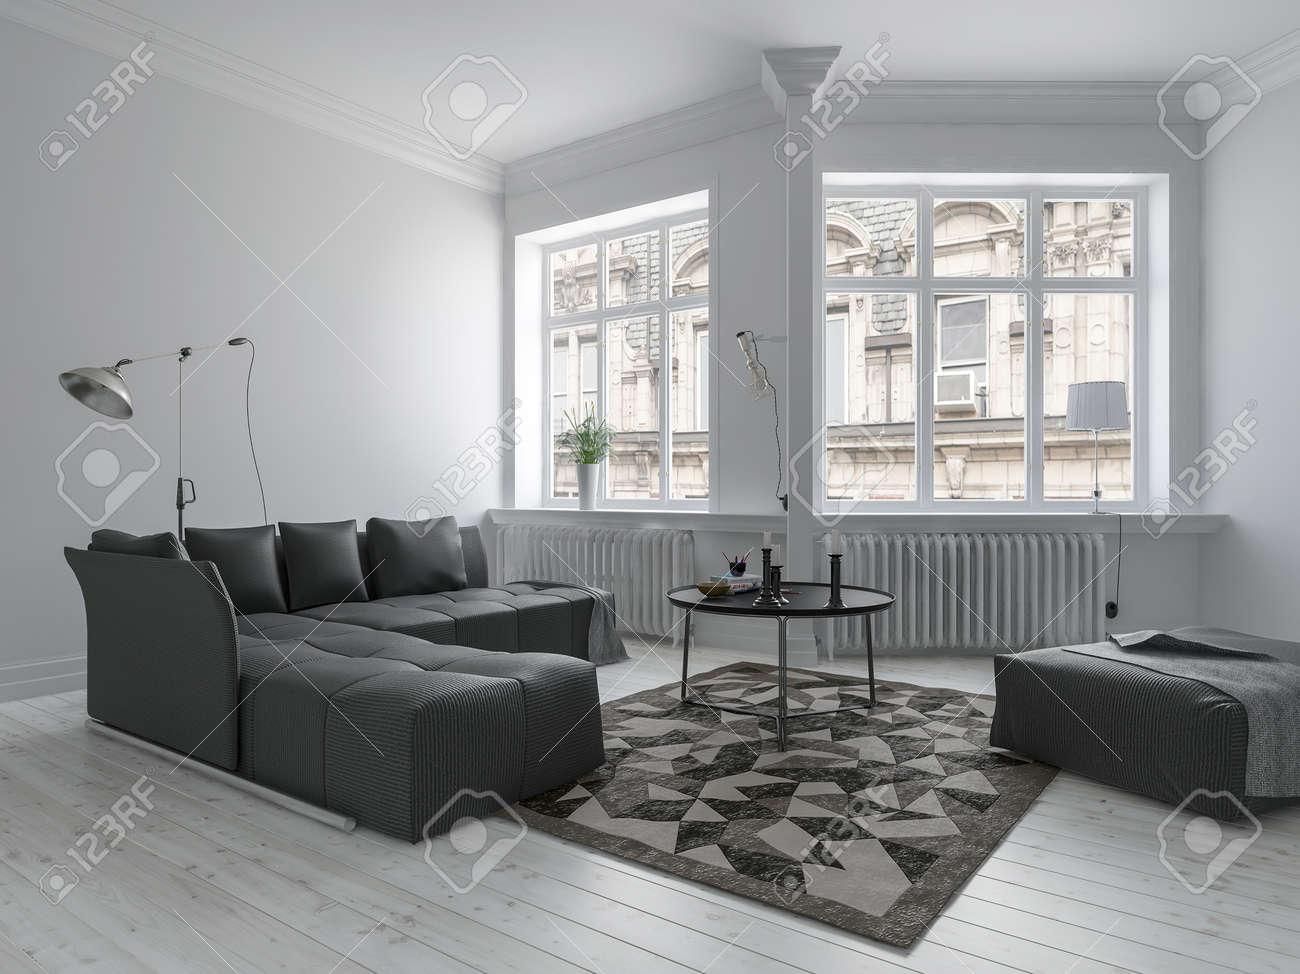 Bright living room in minimalist design with white walls, dark..